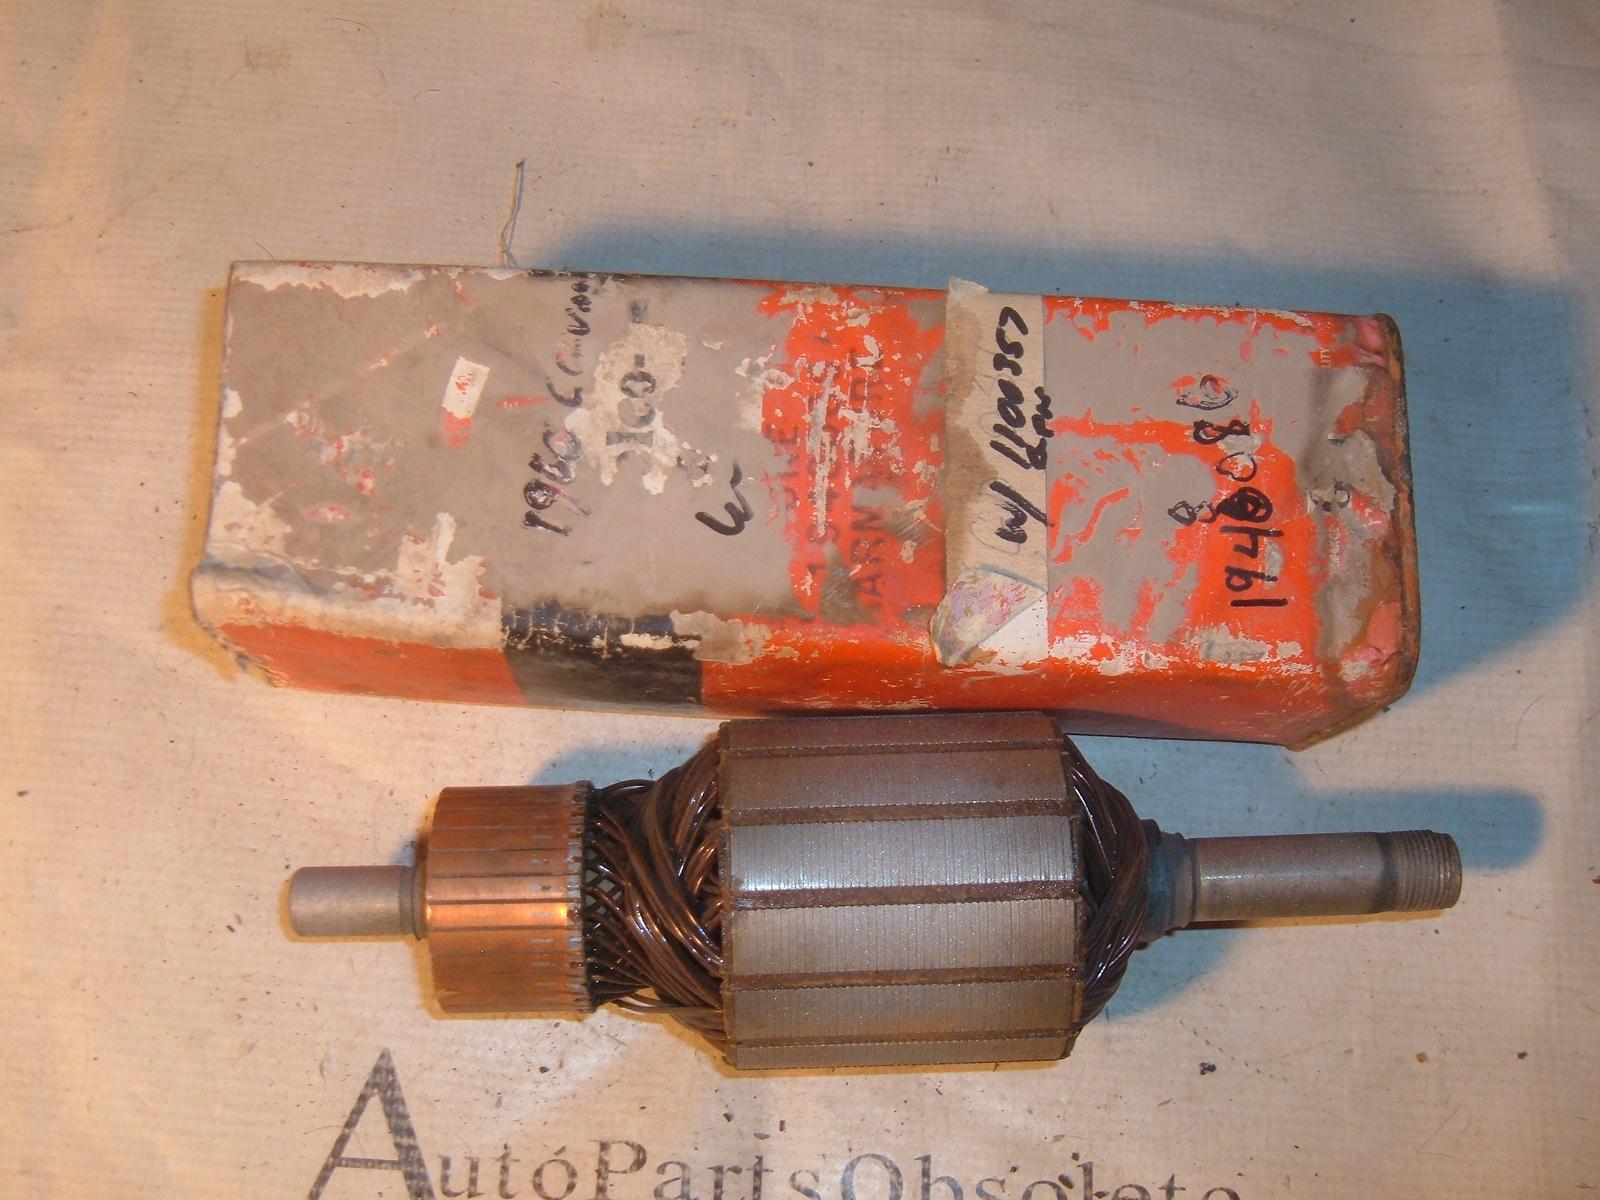 1960 chevrolet corvair generator armature #1948086 (z 1948086)